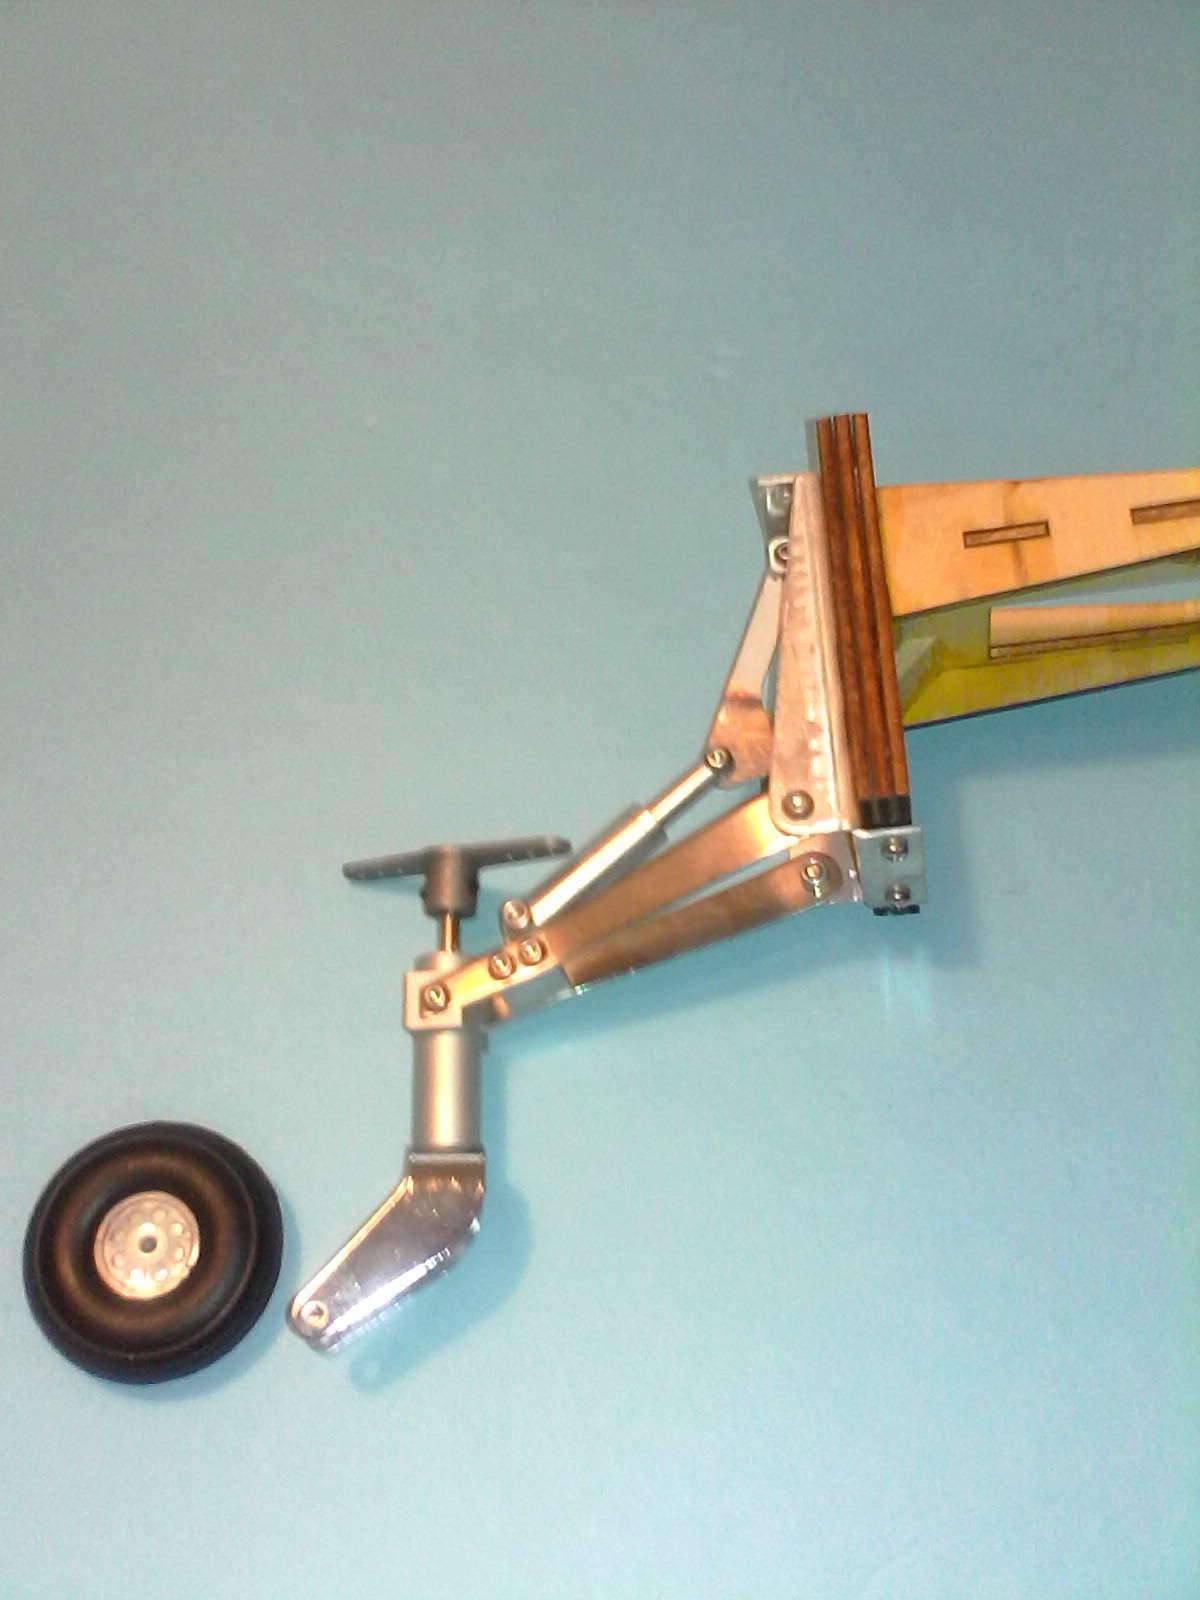 Robart Retractable Tail Wheel